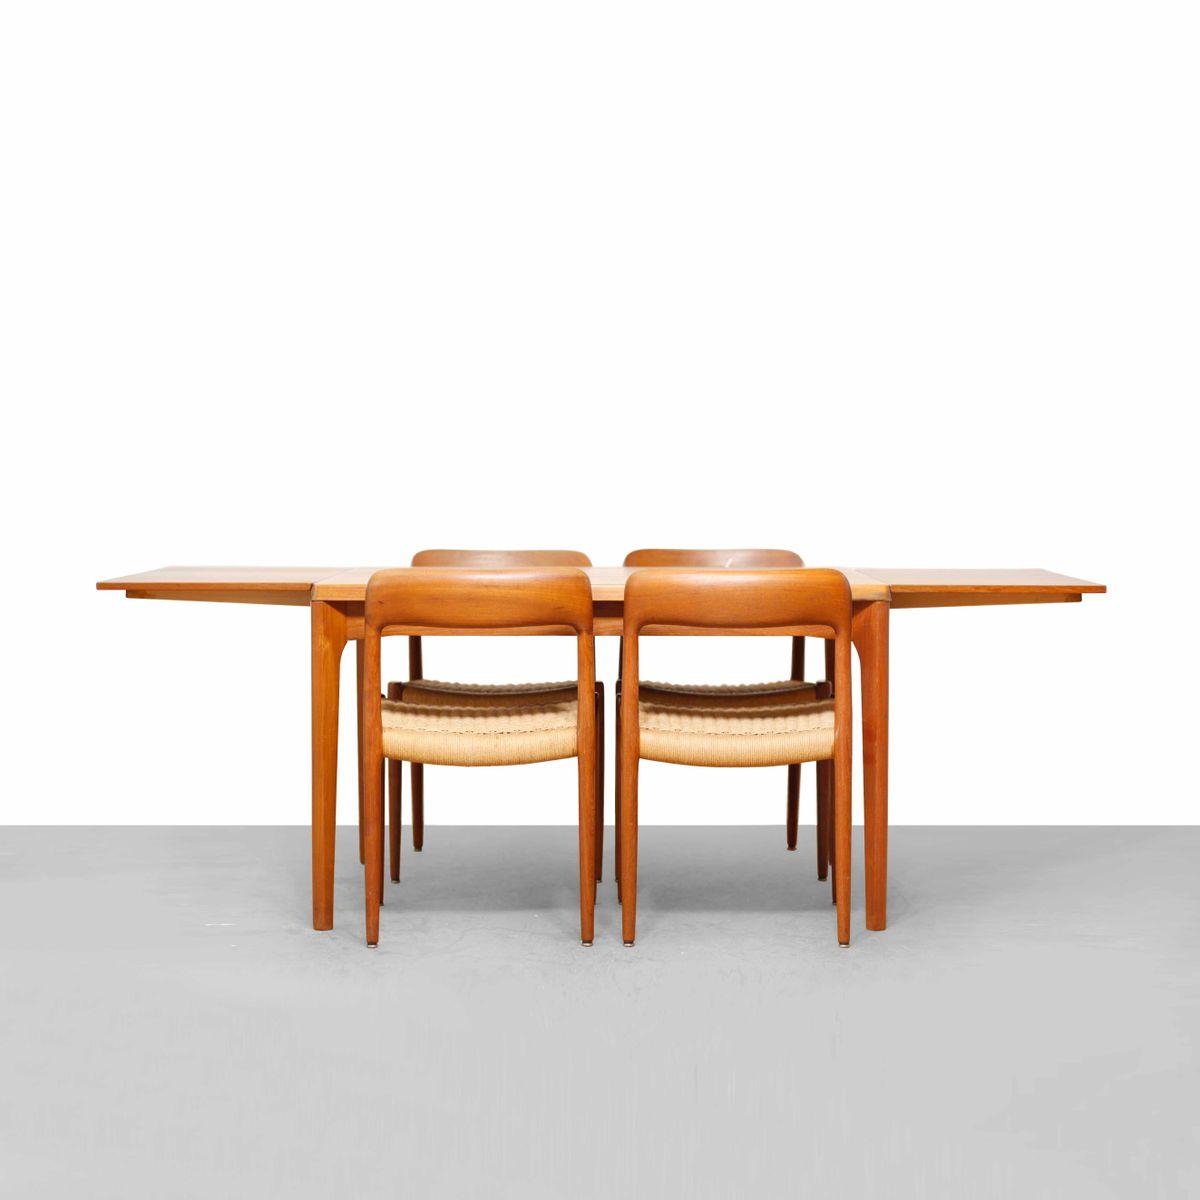 Danish Modern Teak Dining Table by Henning Kj230rnulf for  : danish modern teak dining table by henning kjaernulf for vejle 1960s 3 from www.pamono.eu size 1200 x 1200 jpeg 45kB